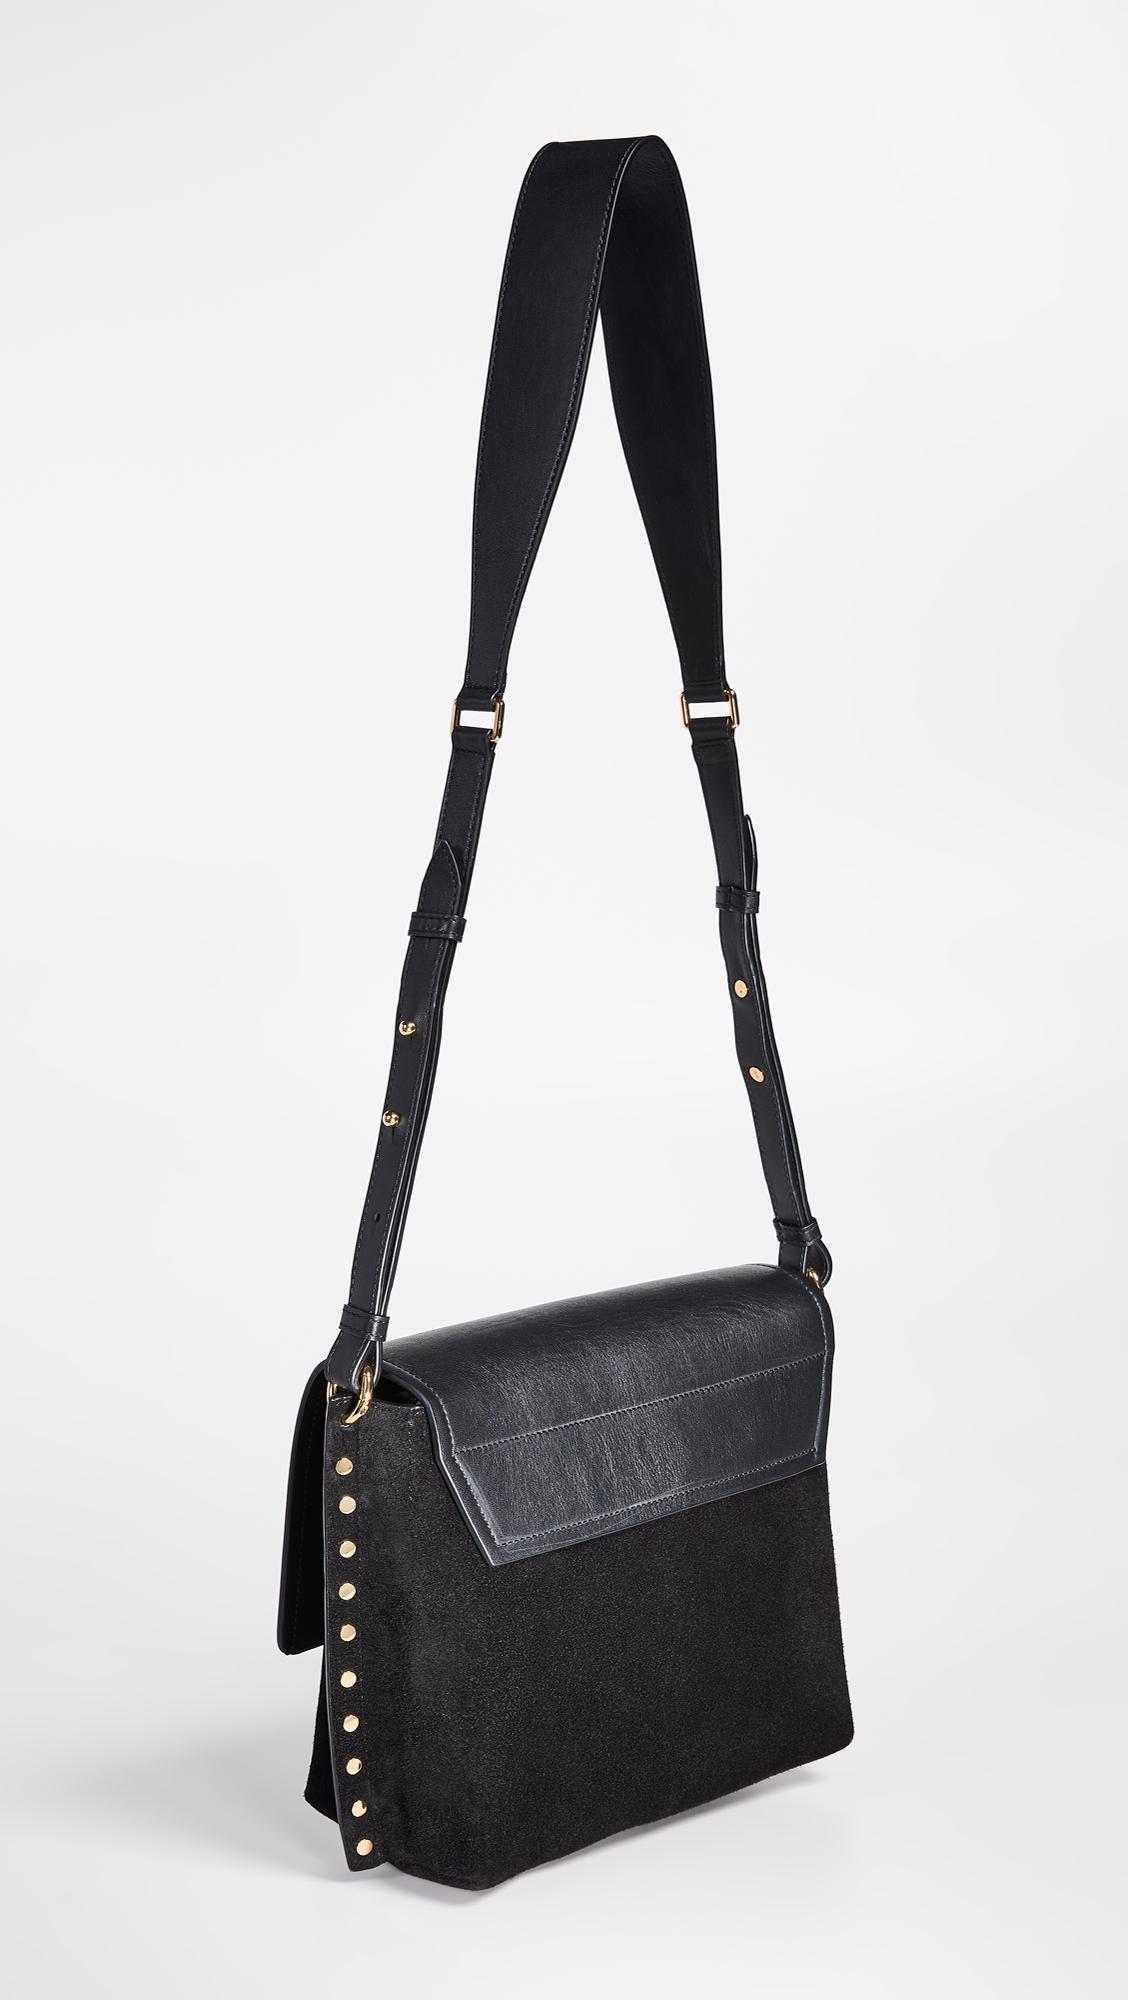 Isabel Marant Leather Asli Cross Body Bag in Black